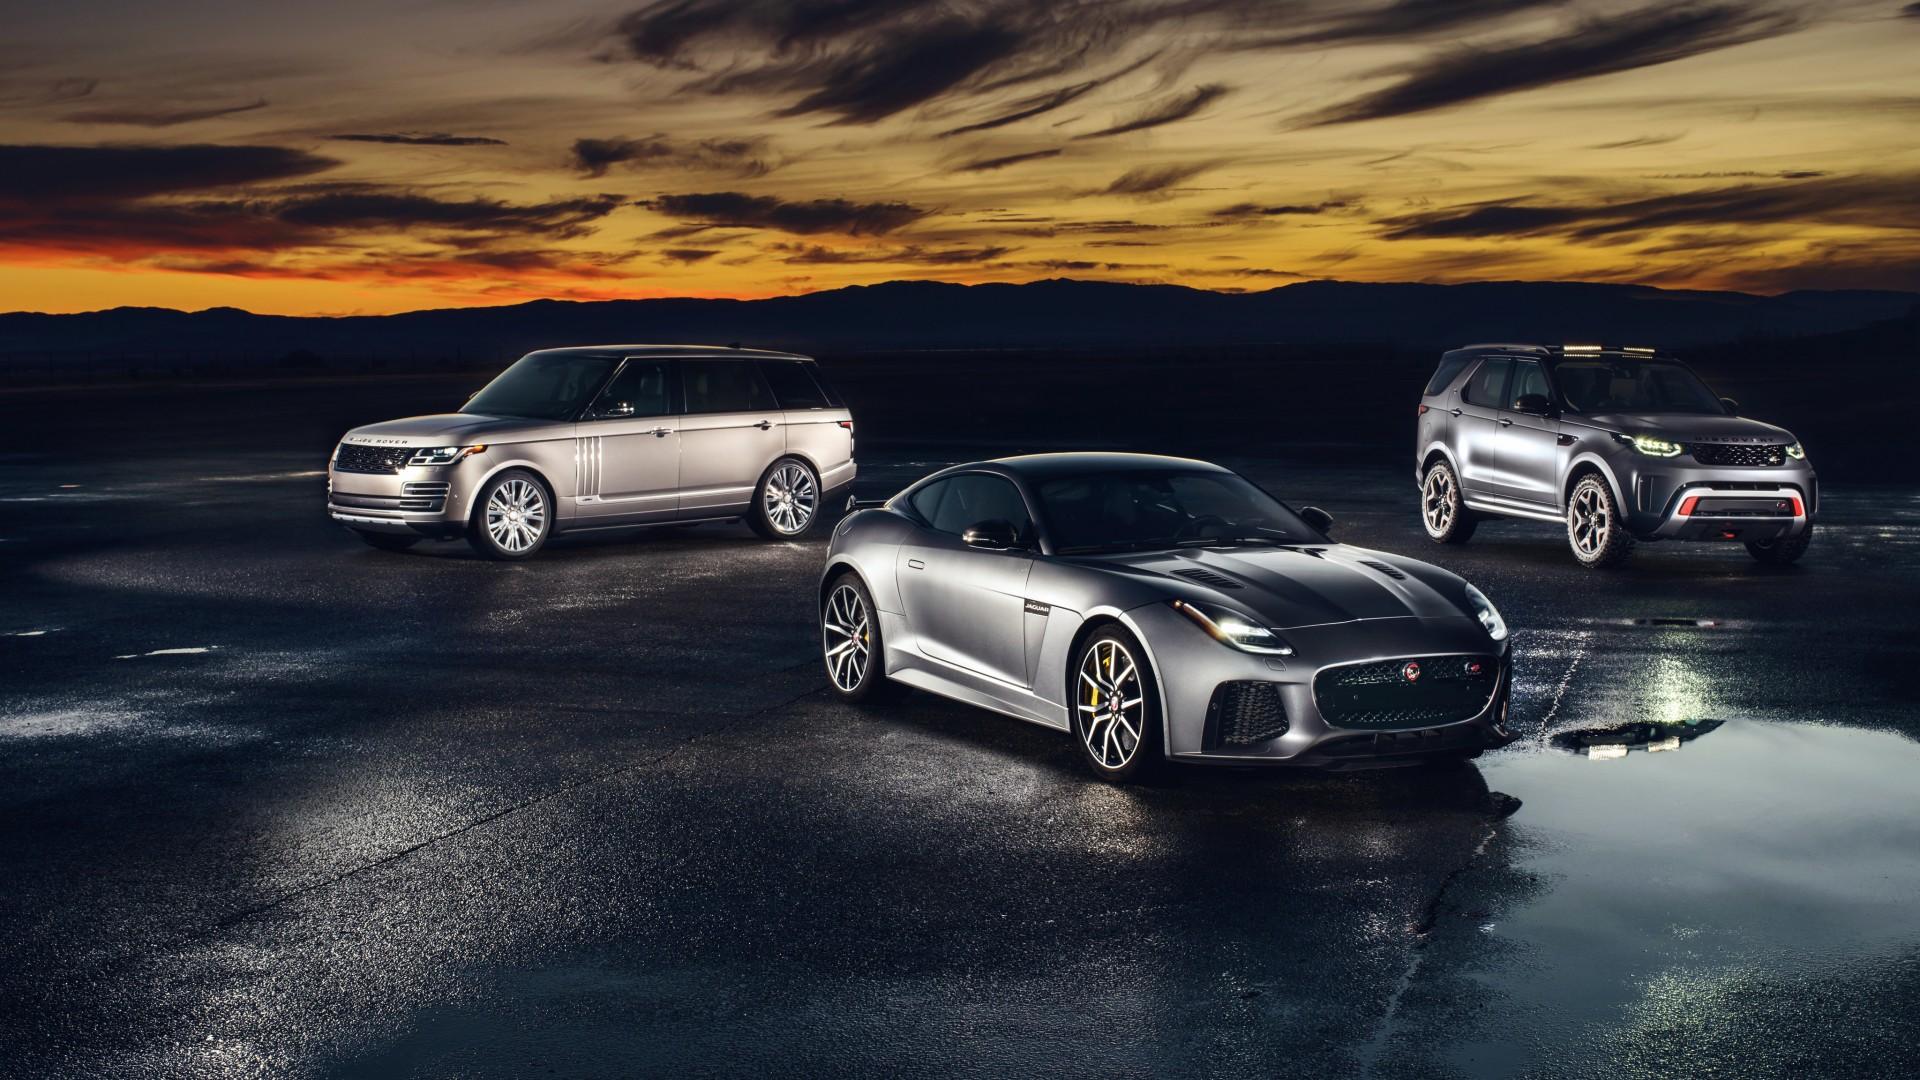 Range Rover Car Hd Wallpaper Download Jaguar Landrover 2017 4k Wallpaper Hd Car Wallpapers